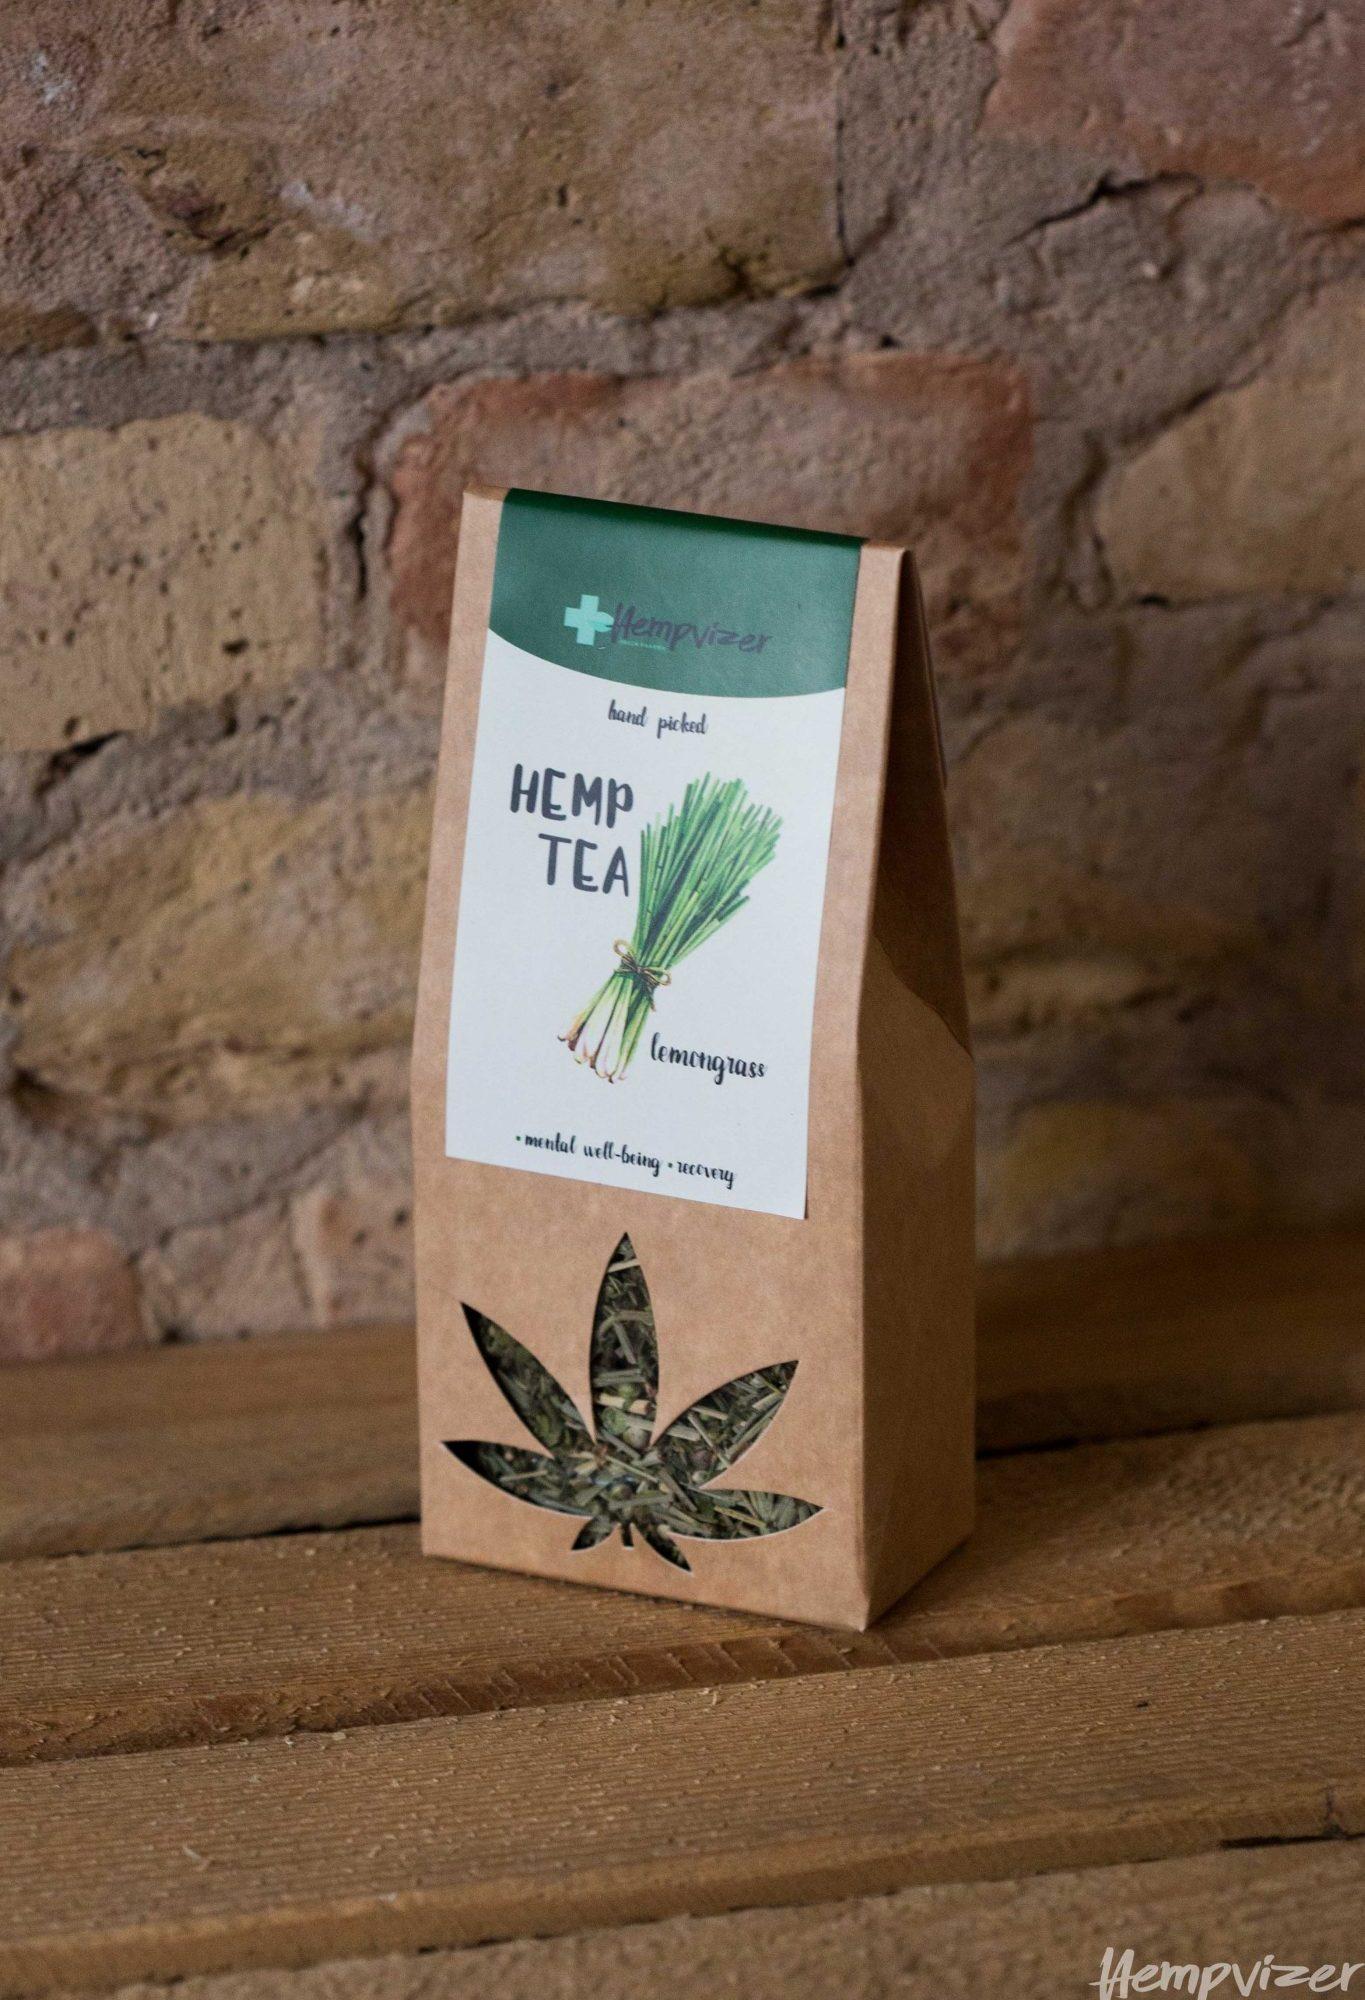 Hempvizer Hemp tea with lemon grass